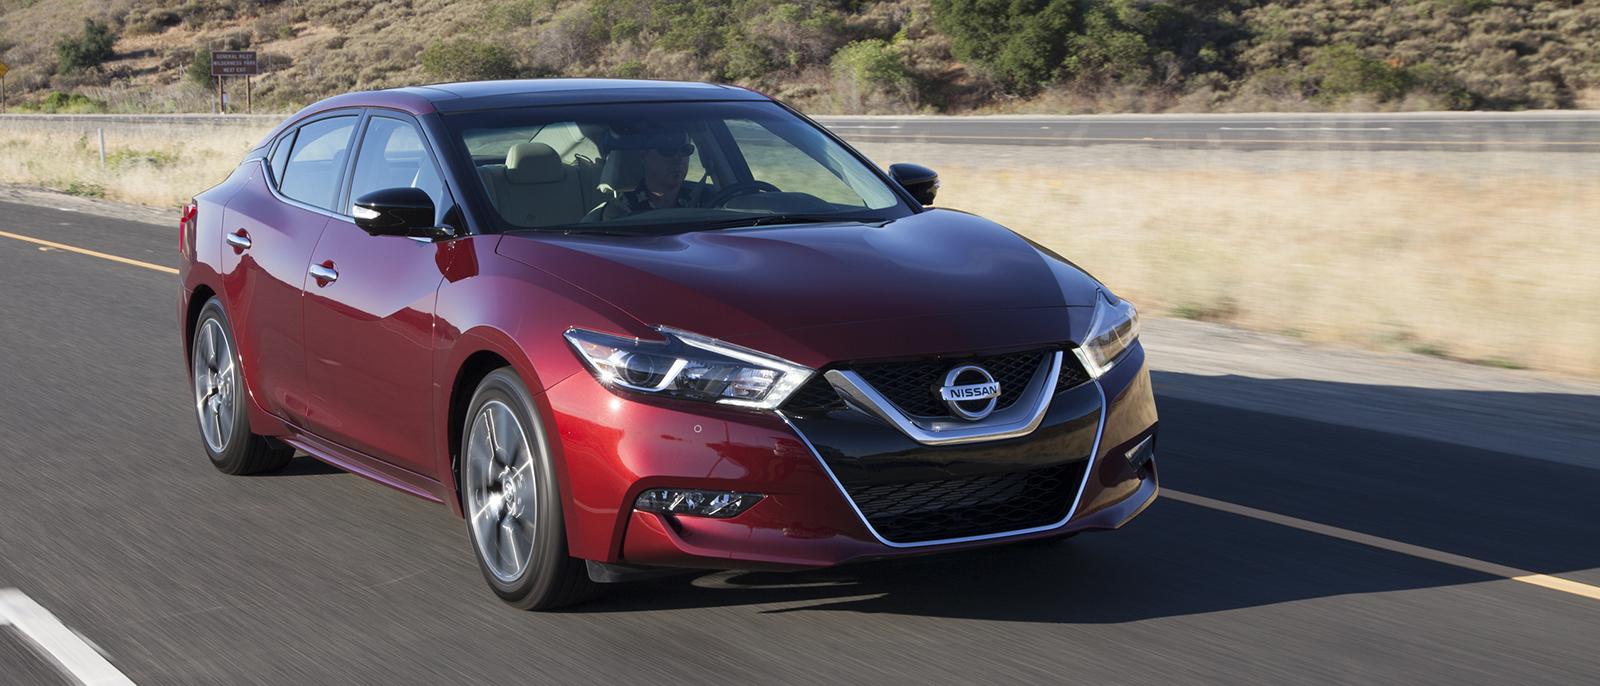 2017 Nissan Maxima driving